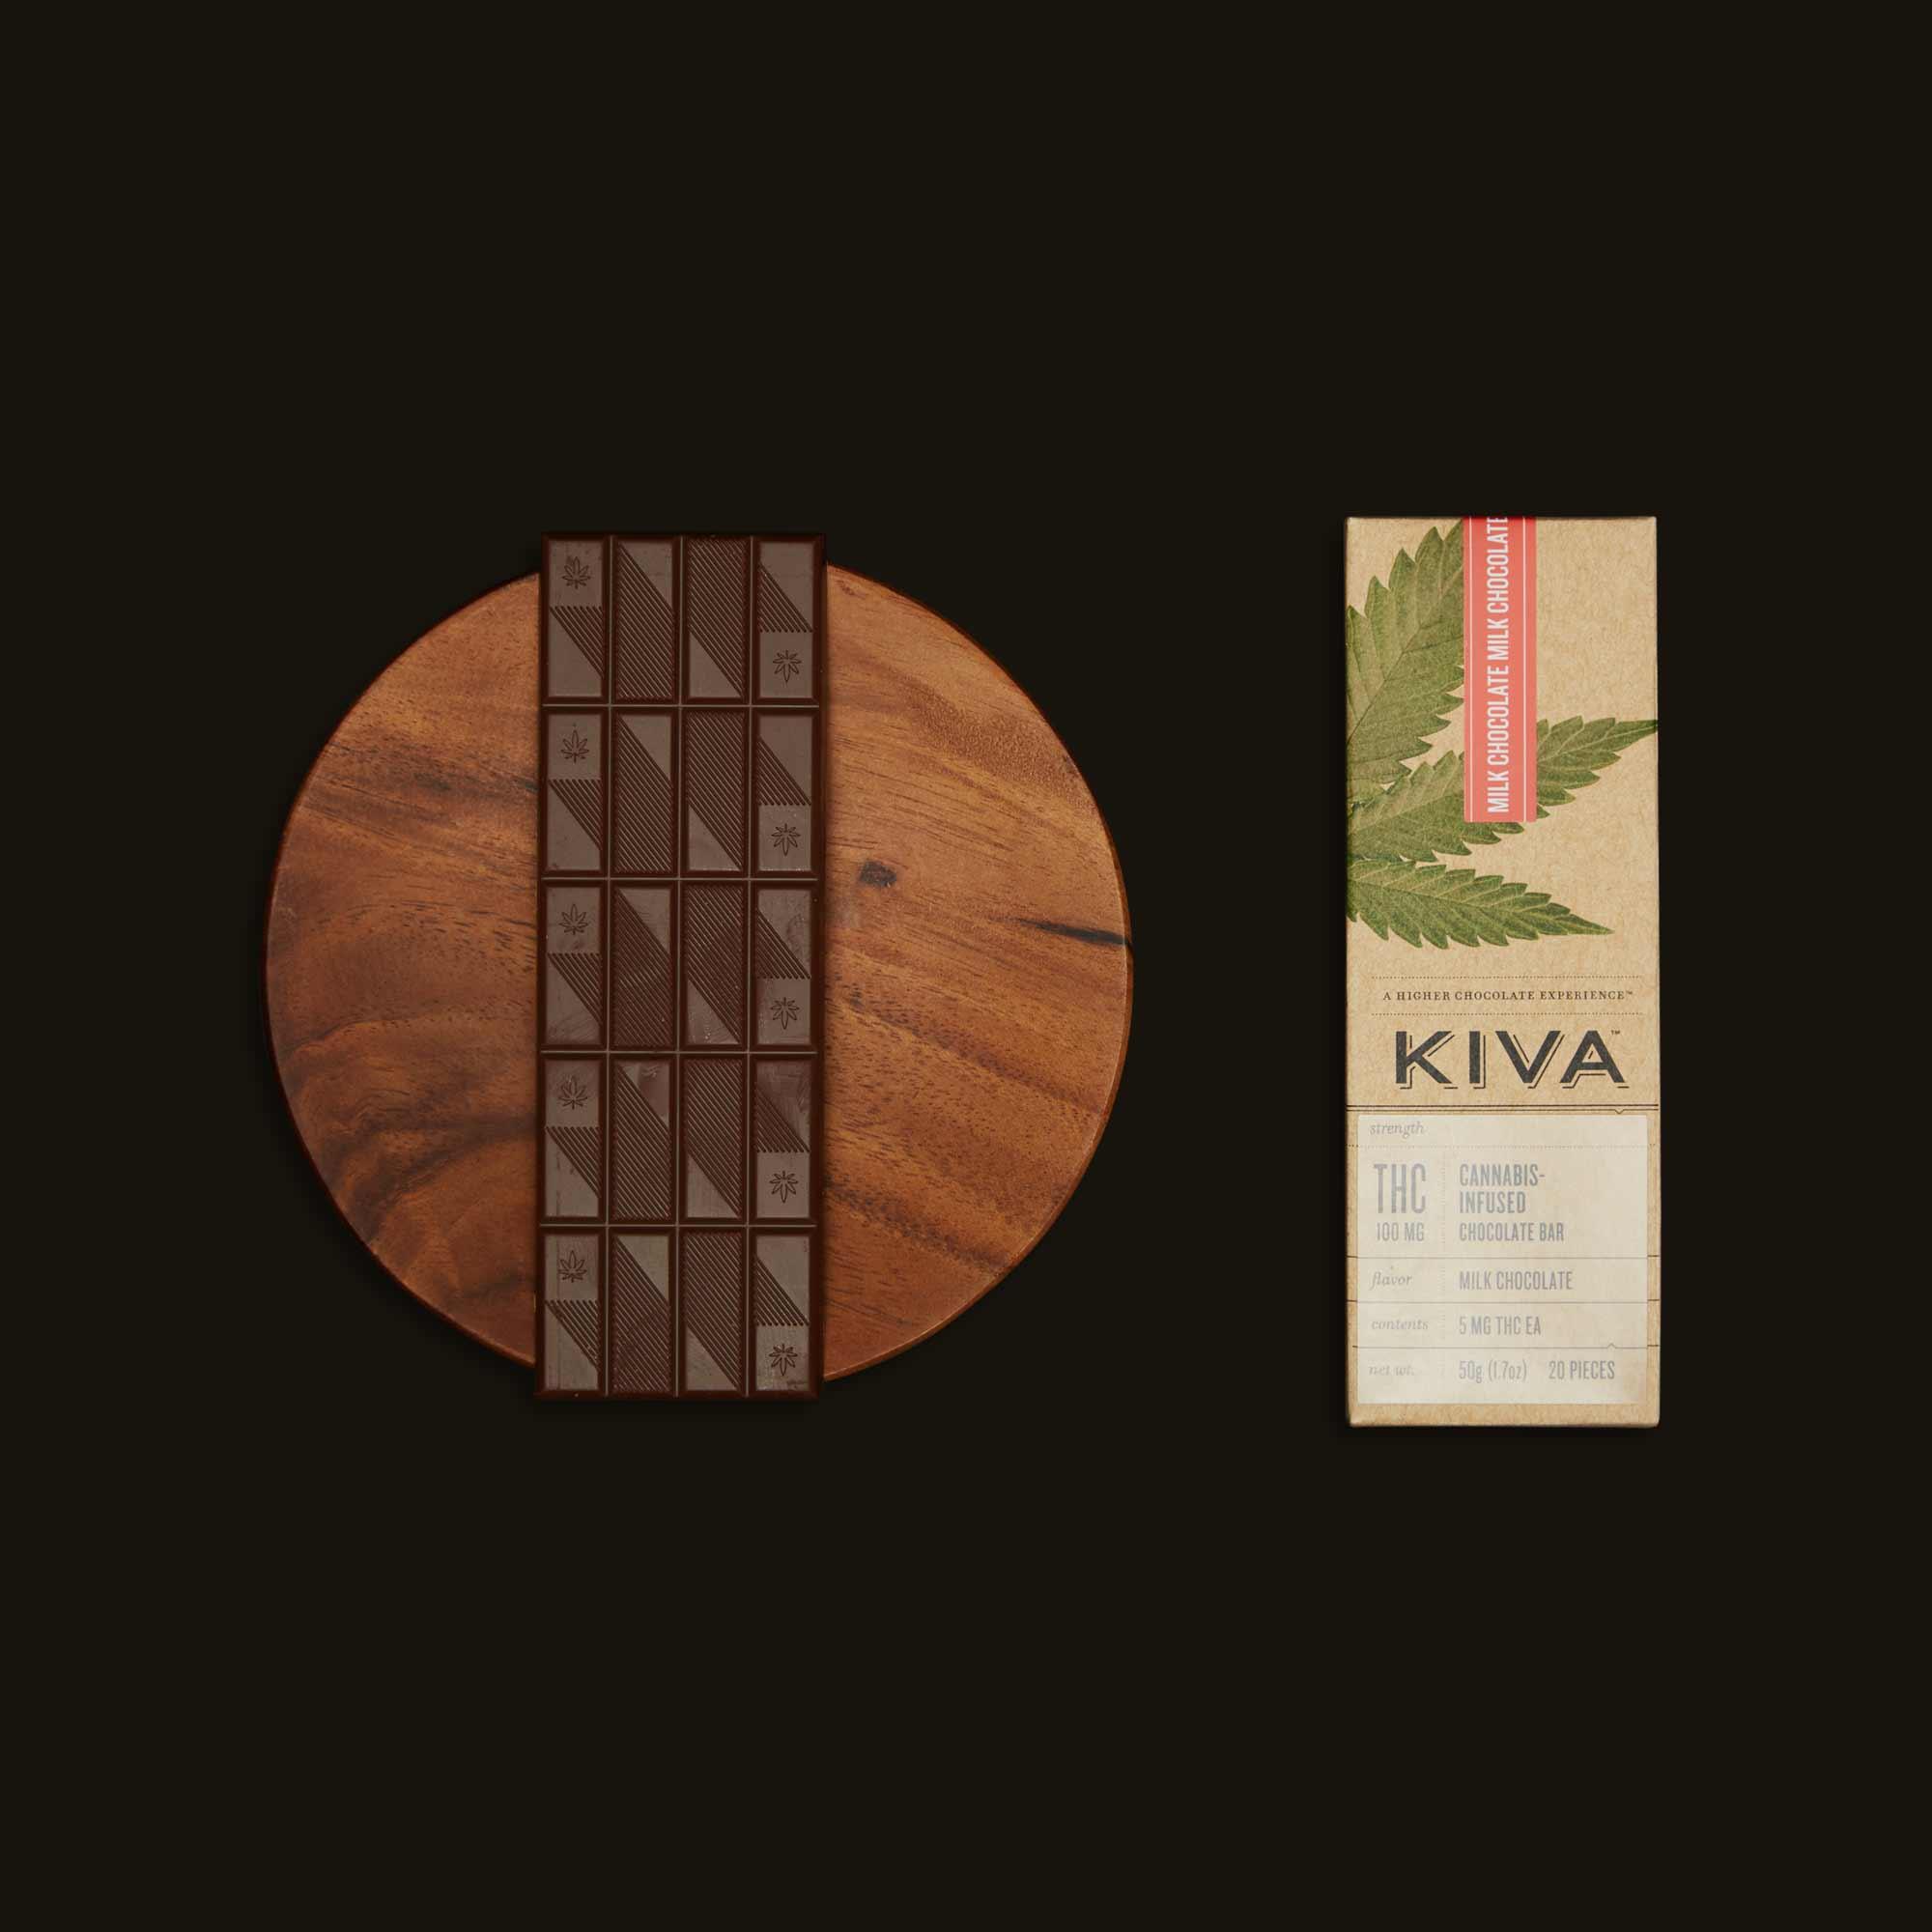 kiva milk Chocolate Bar as reviewed